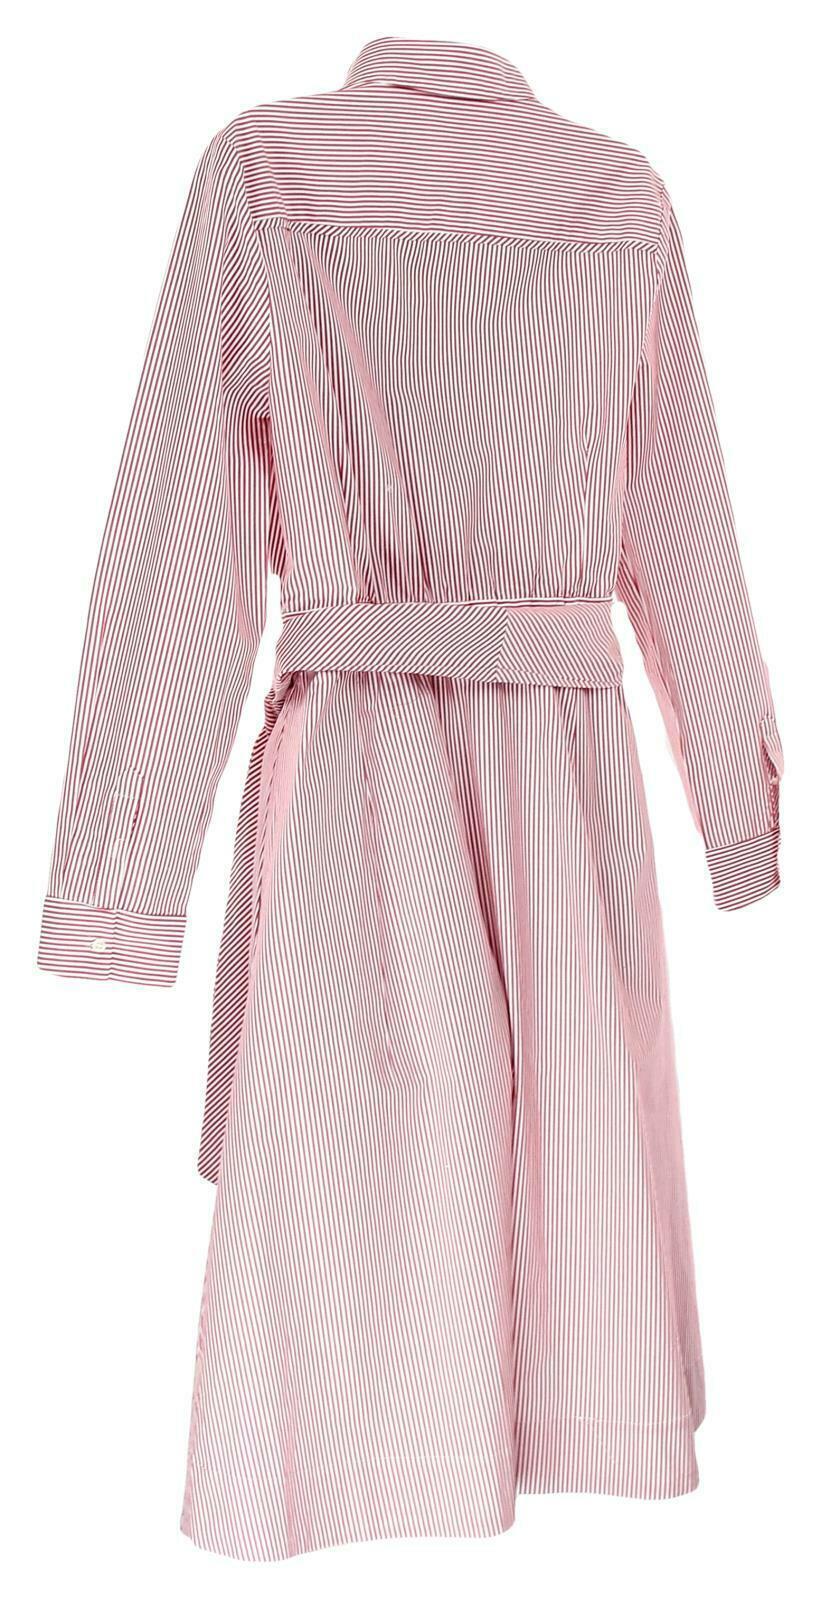 JCrew Womens Tie Waist Shirt Dress Red White Stripes Button Front Dress 14 H7791 image 5